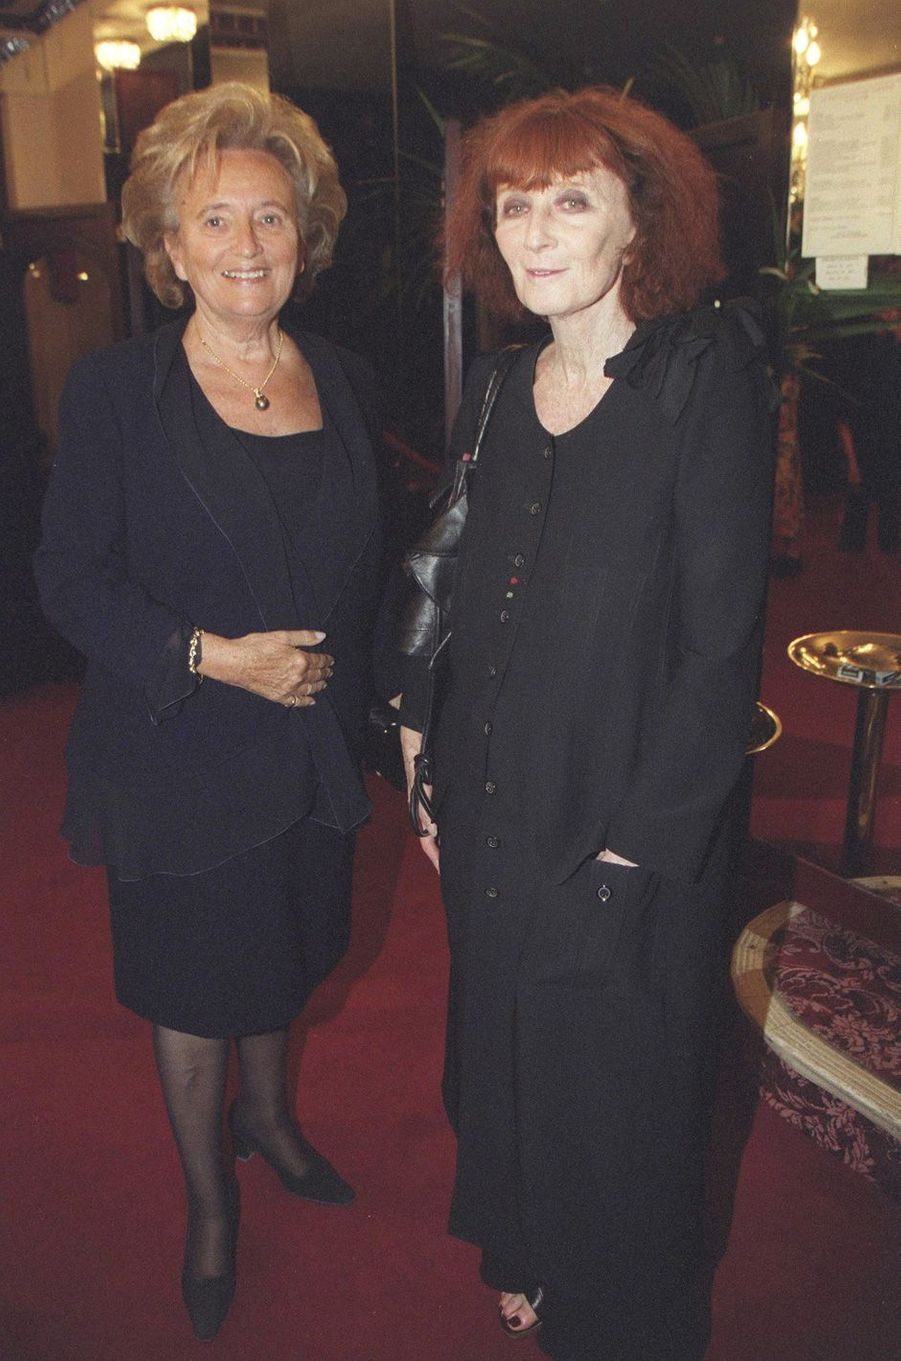 Bernadette Chirac et Sonia Rykiel.